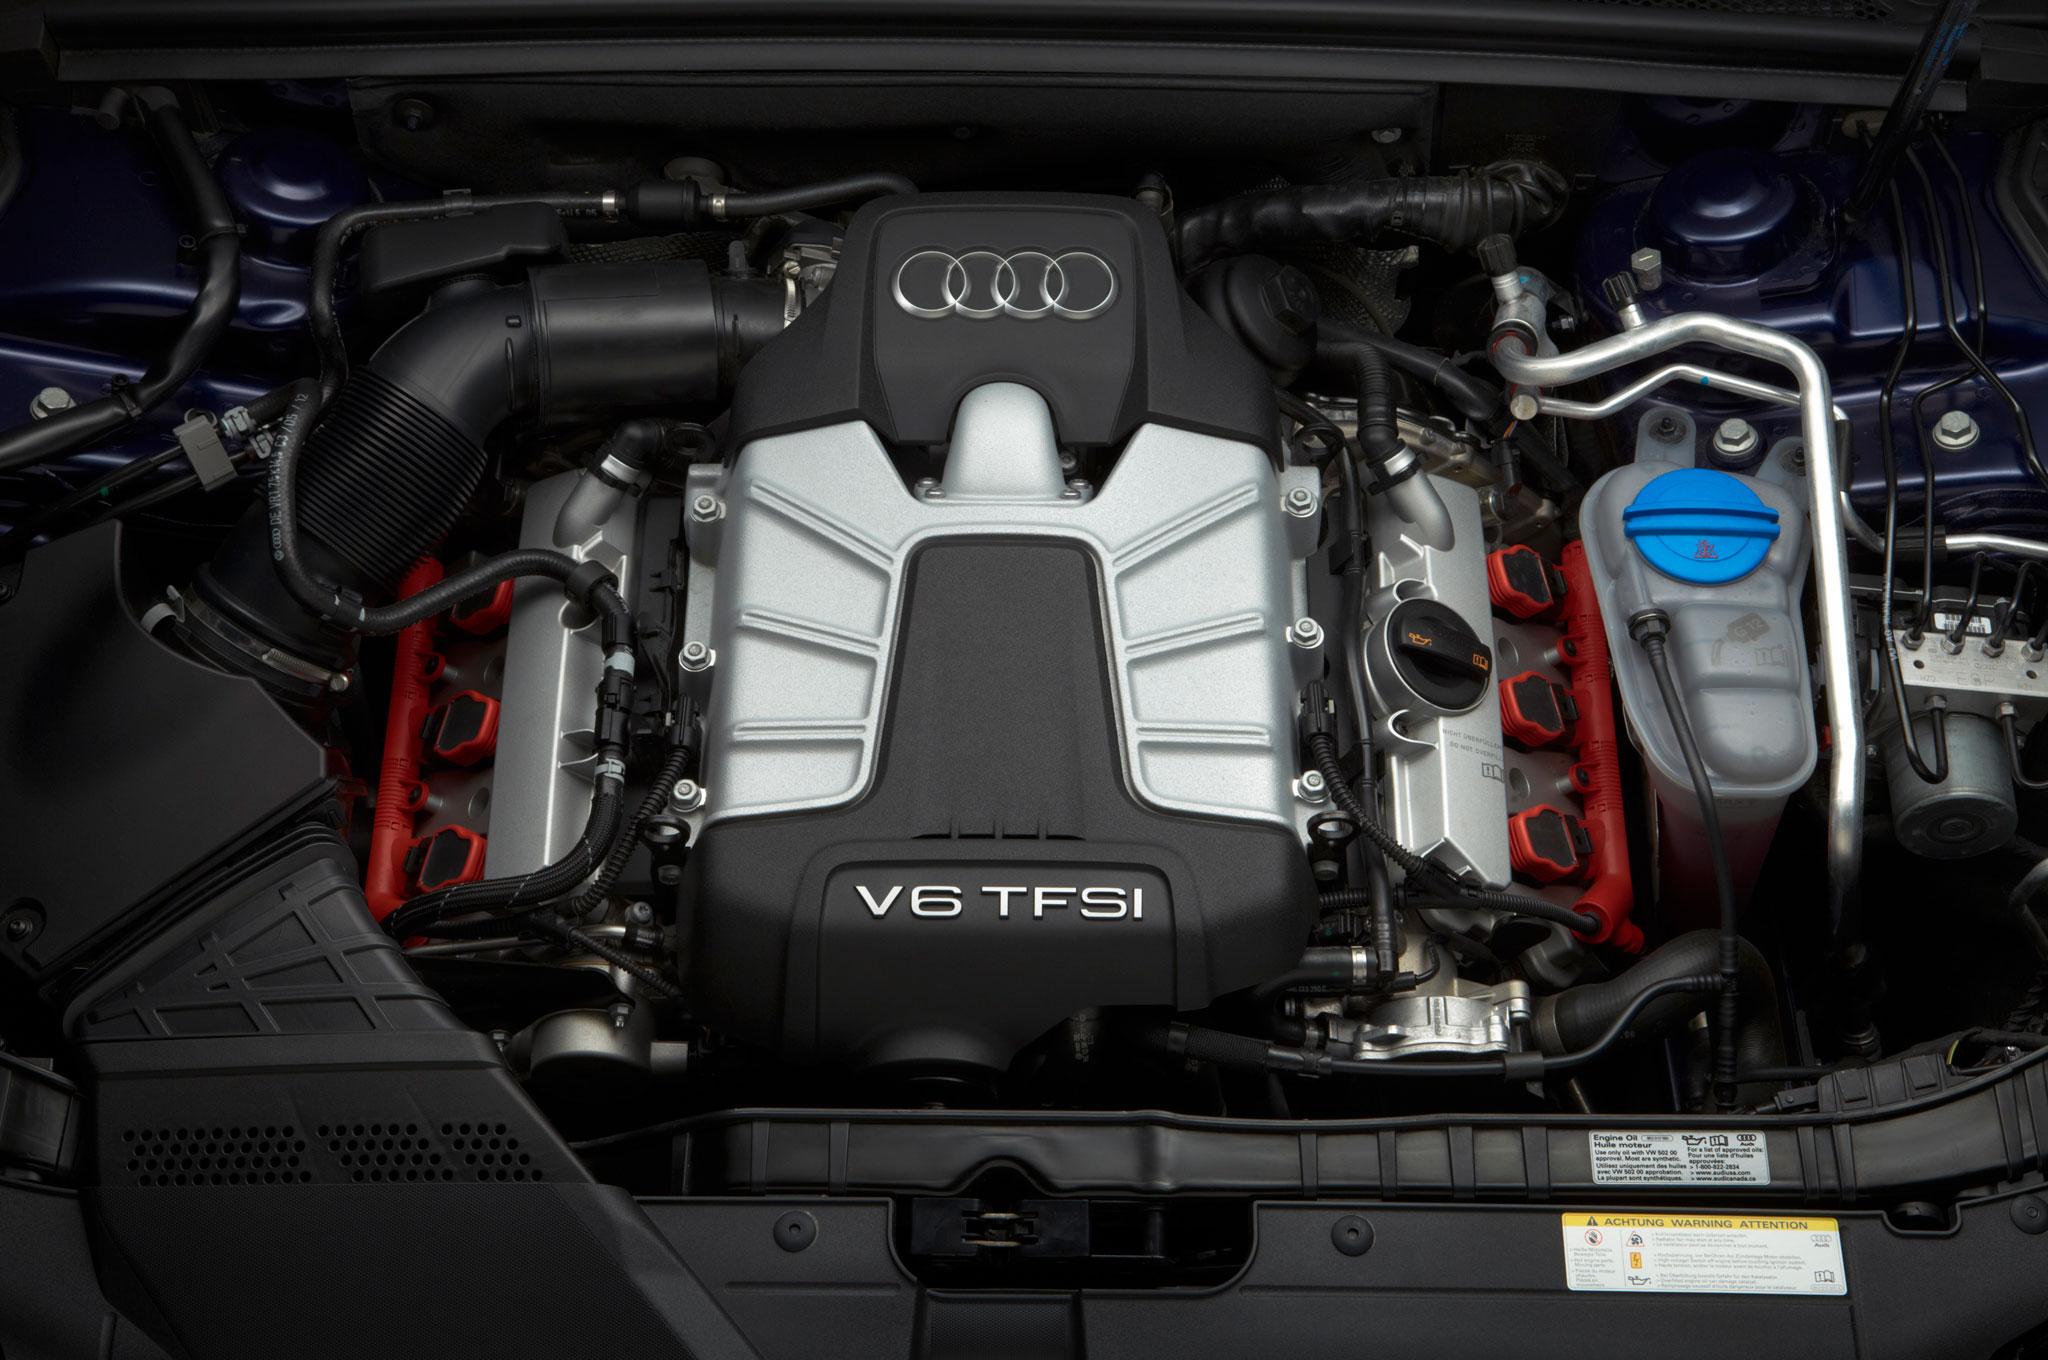 2015 Audi S5 Engine Diagram Car Fuse Box Wiring 2013 Mercedes Benz C250 Coupe Spyker B6 Venator Concept Debuting At Geneva Rh Automobilemag Com 2018